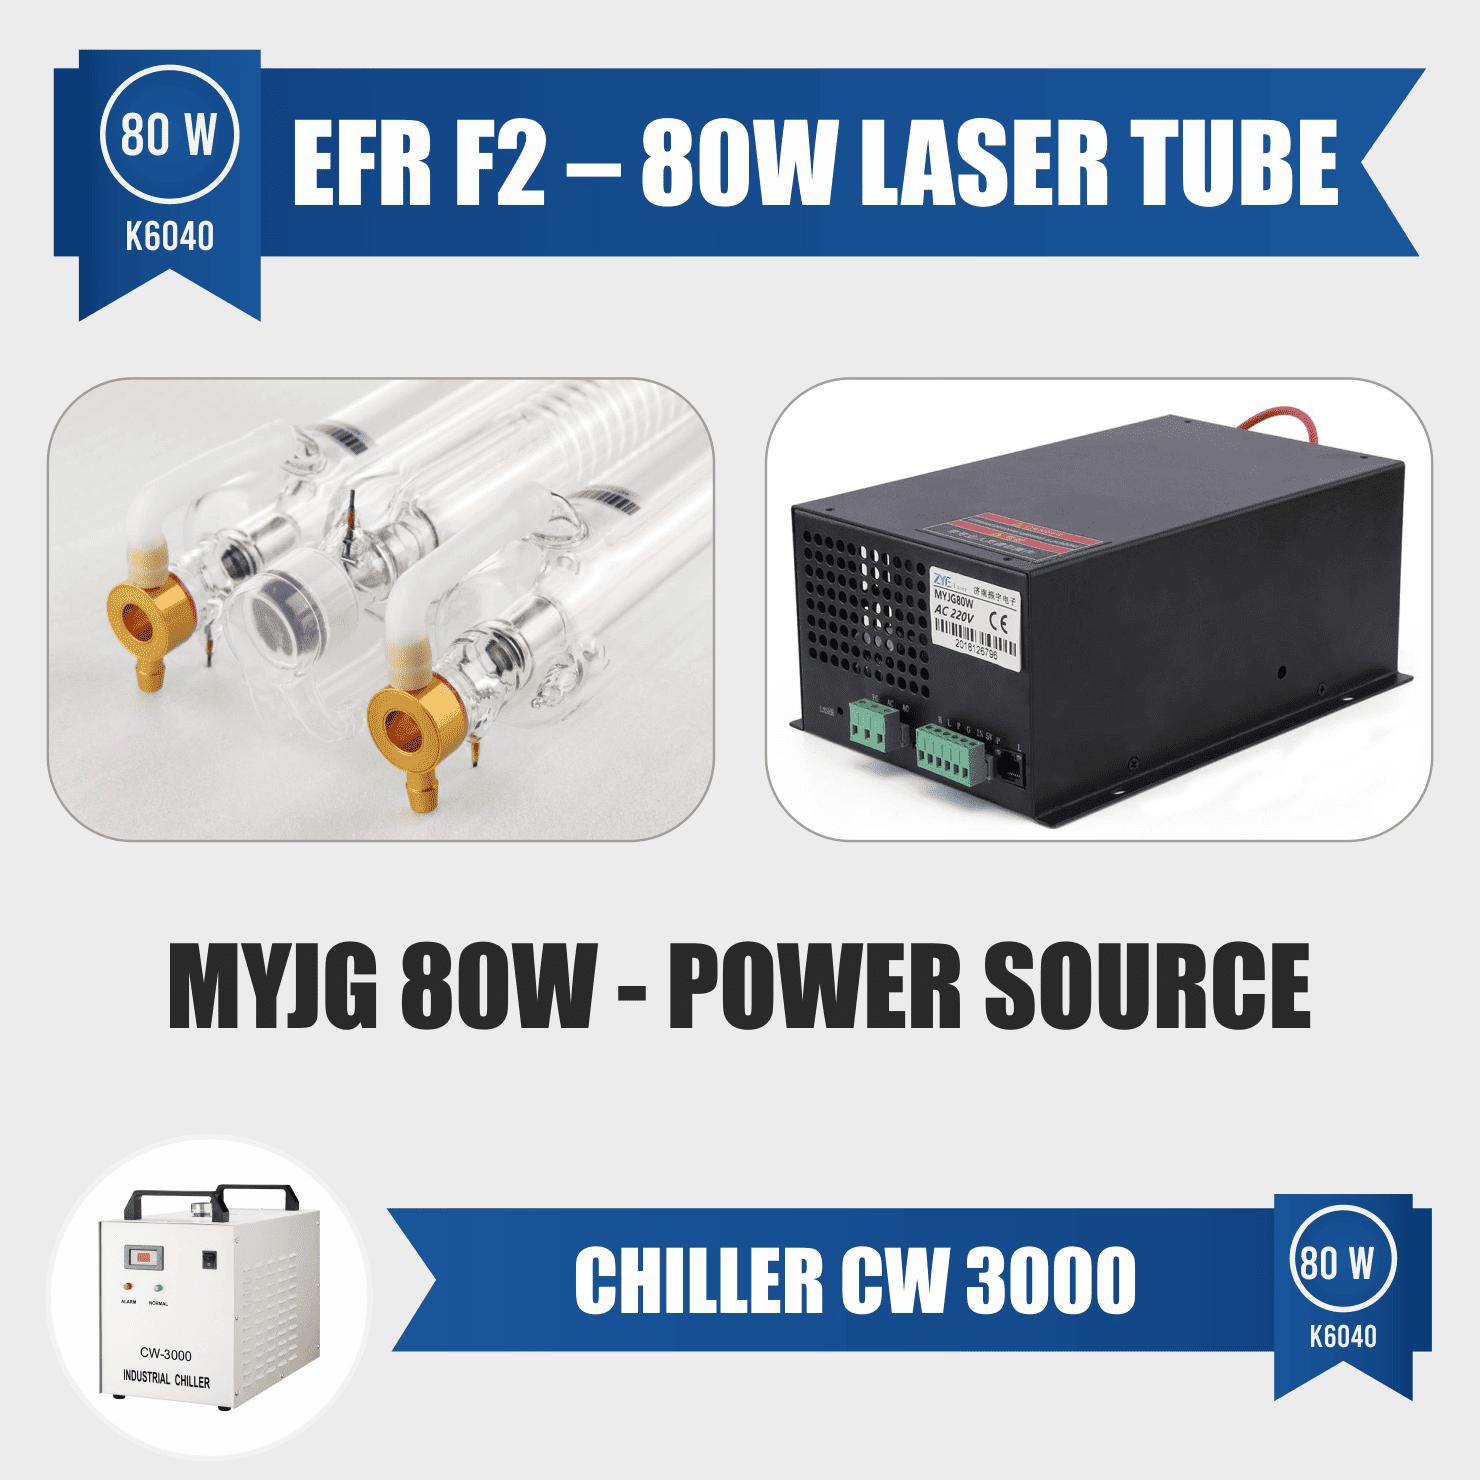 laser engraver with efr tub